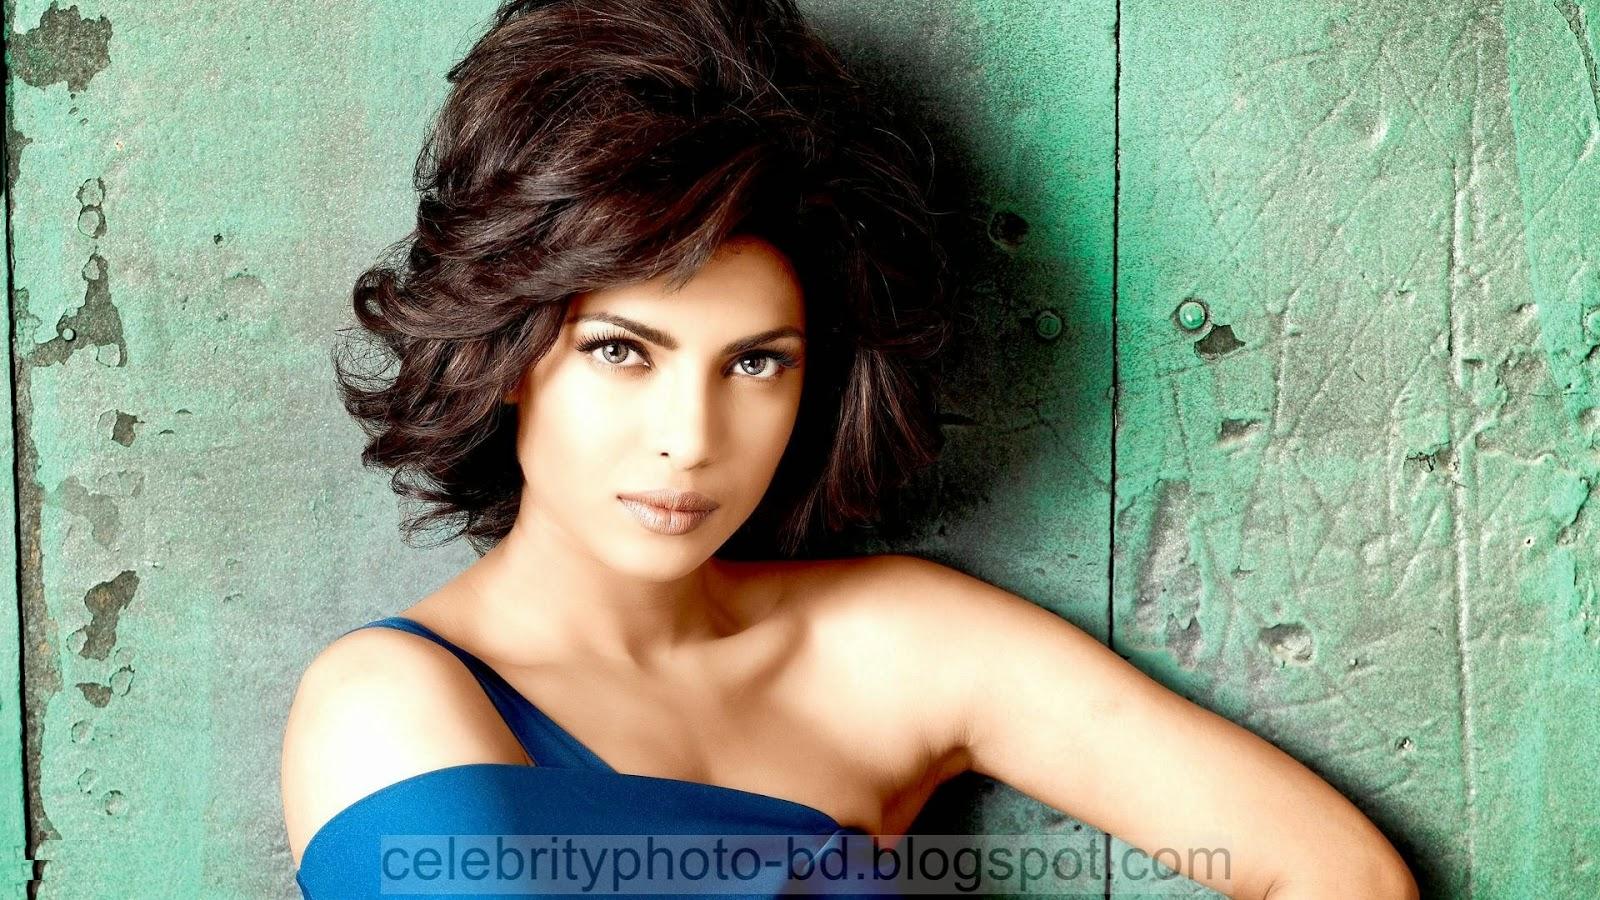 Priyanka Chopra's Hot Sexiest HD Photoshoot 2015 With Body Measurement